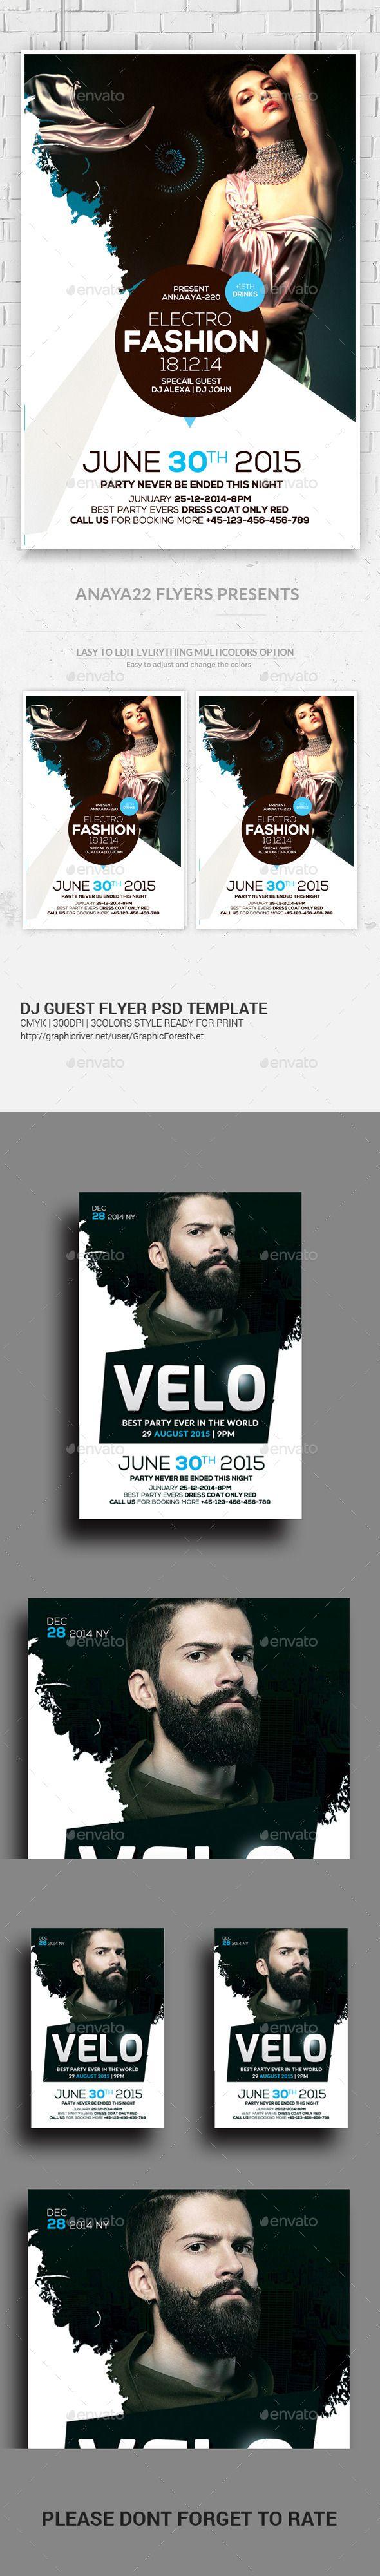 Electro Concert Dj Flyers Bundle | Electro music, Psd templates and ...